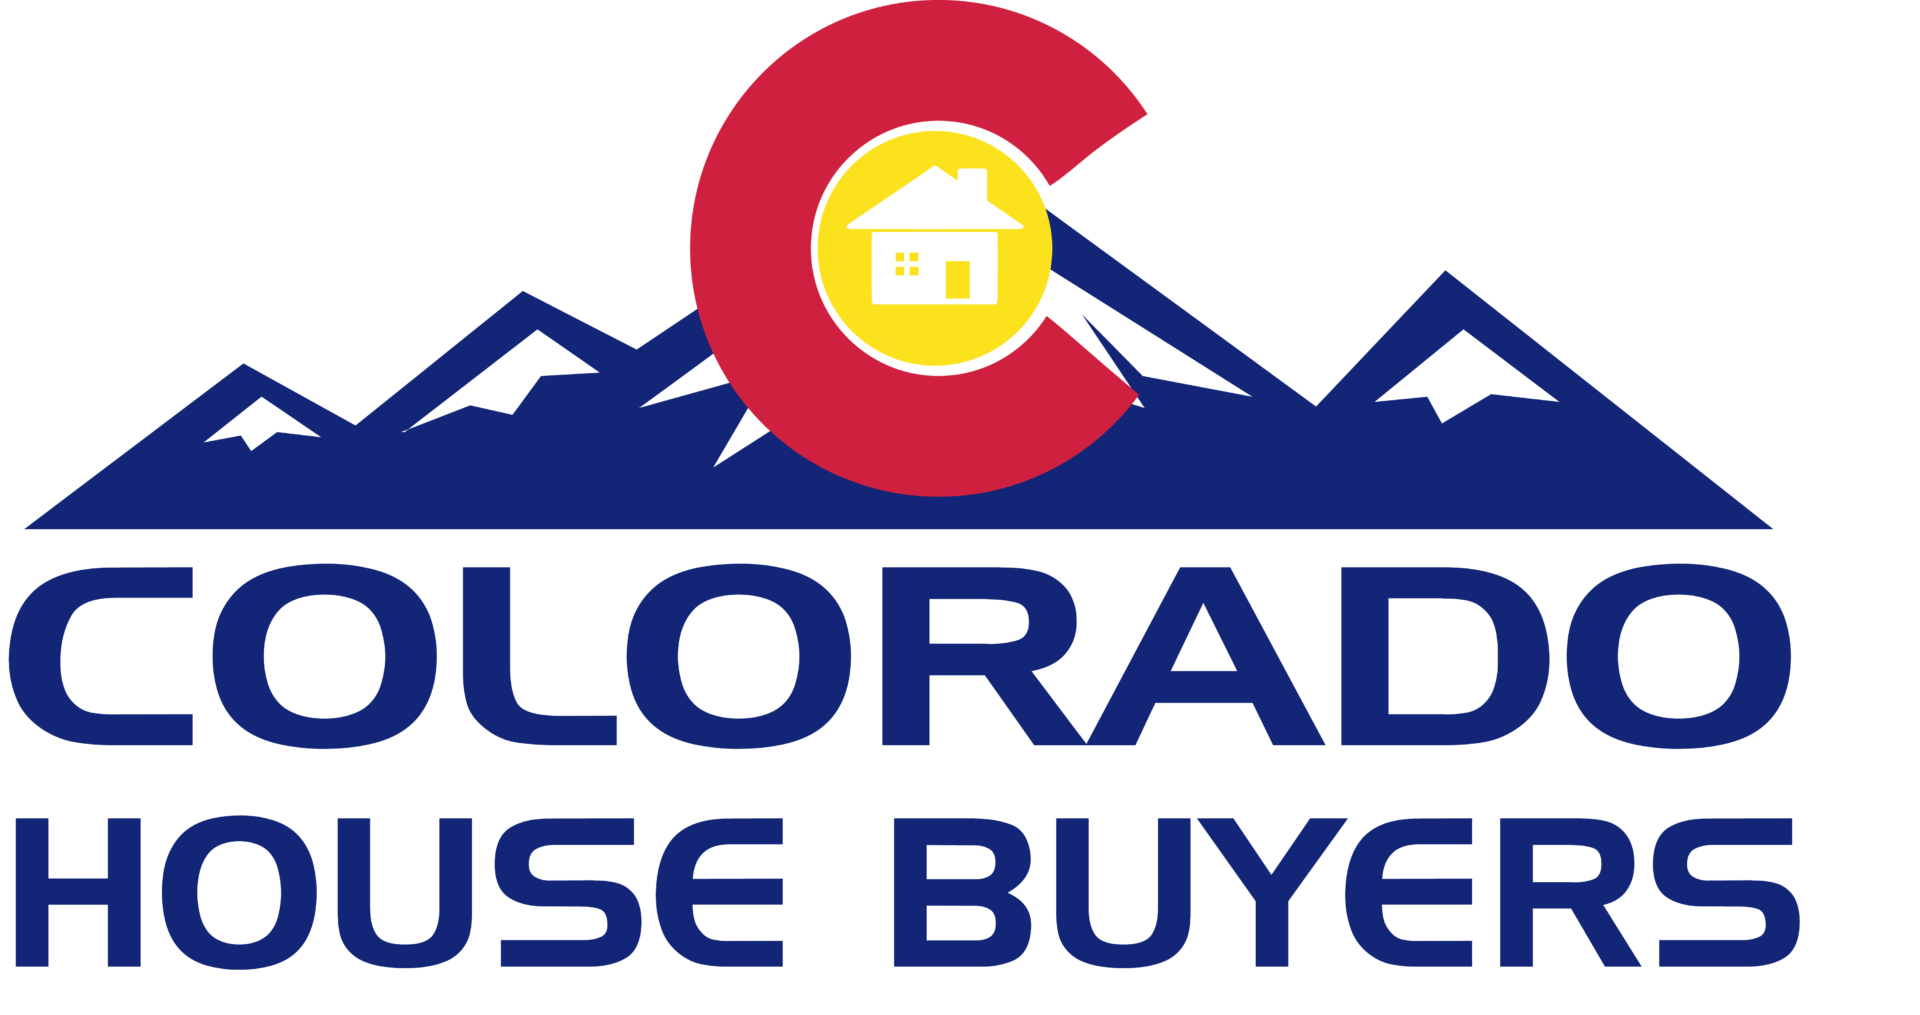 Colorado House Buyers  logo